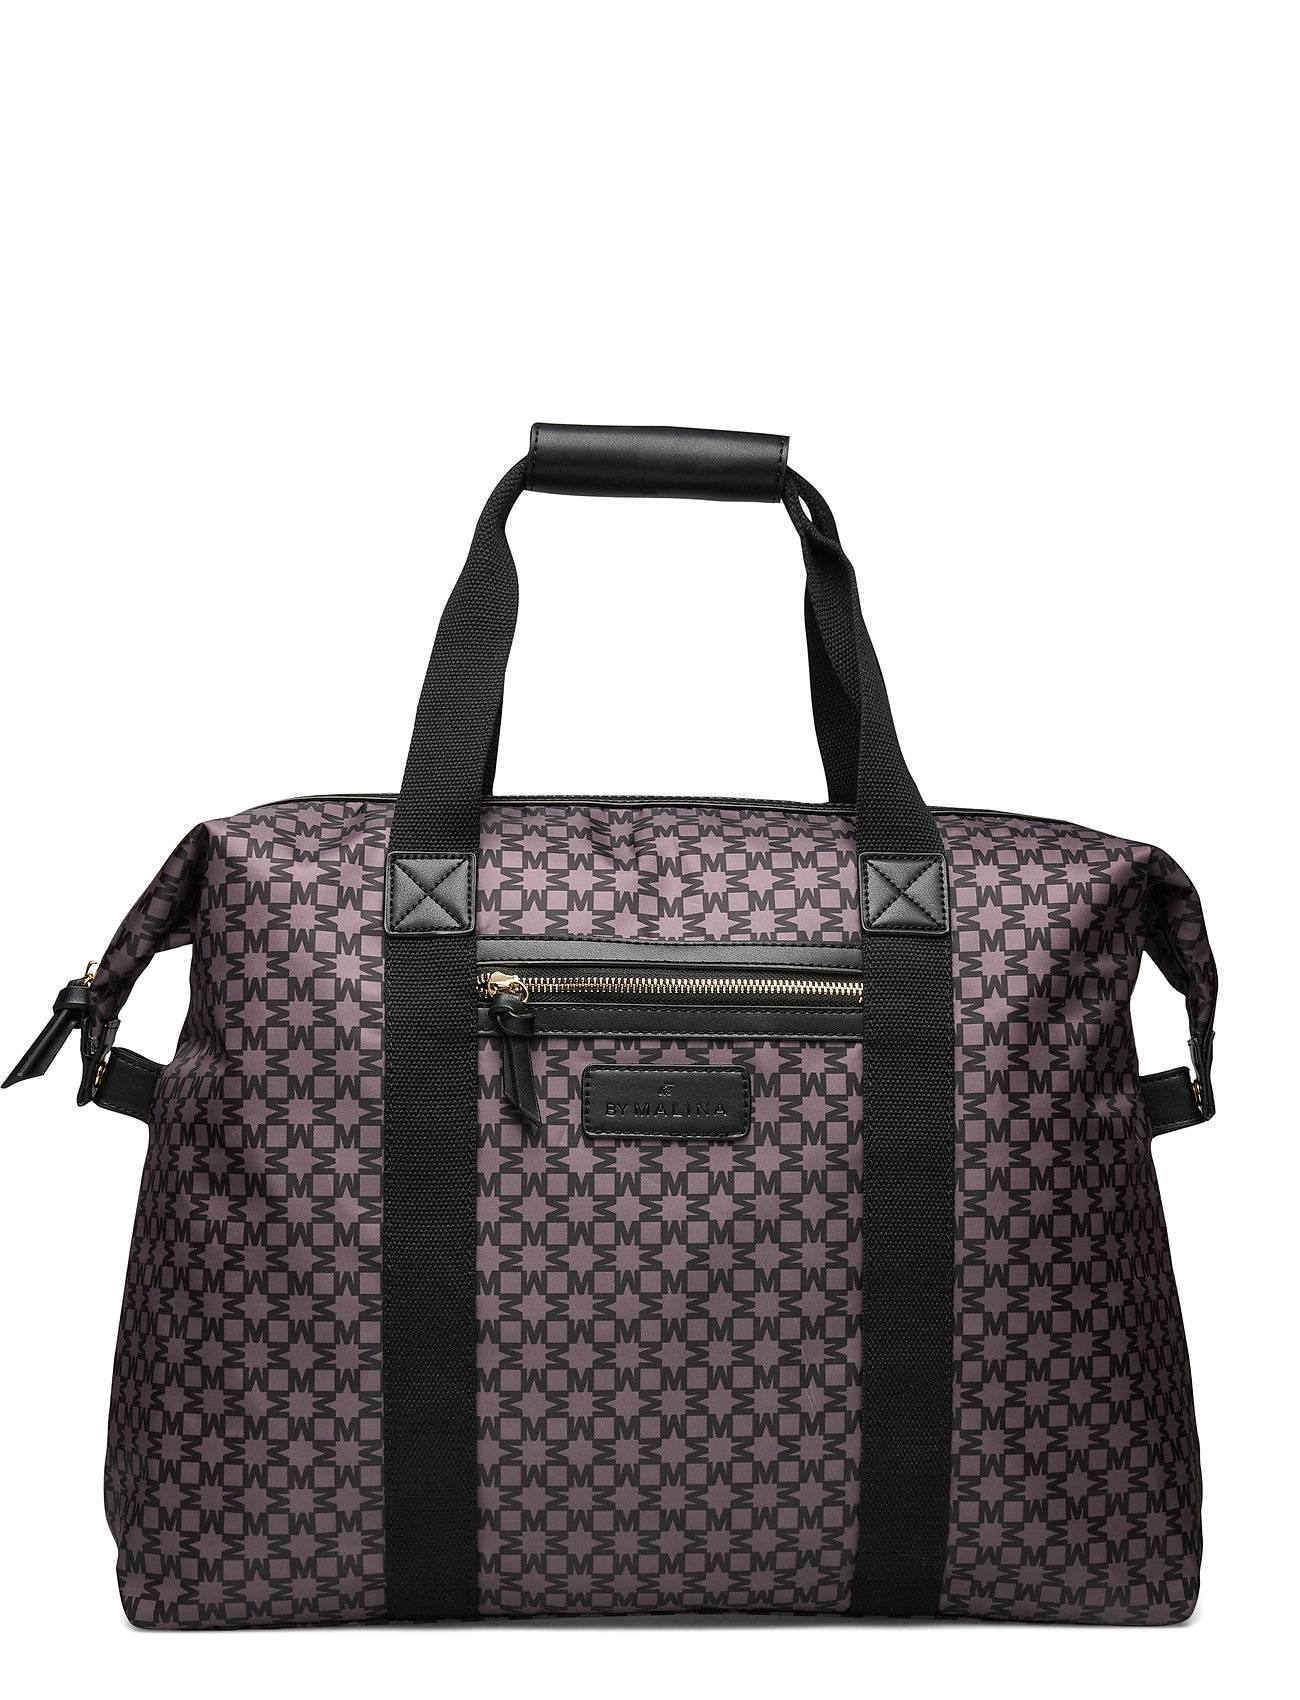 By Malina Travel Bag Bags Weekend & Gym Bags Monivärinen/Kuvioitu By Malina